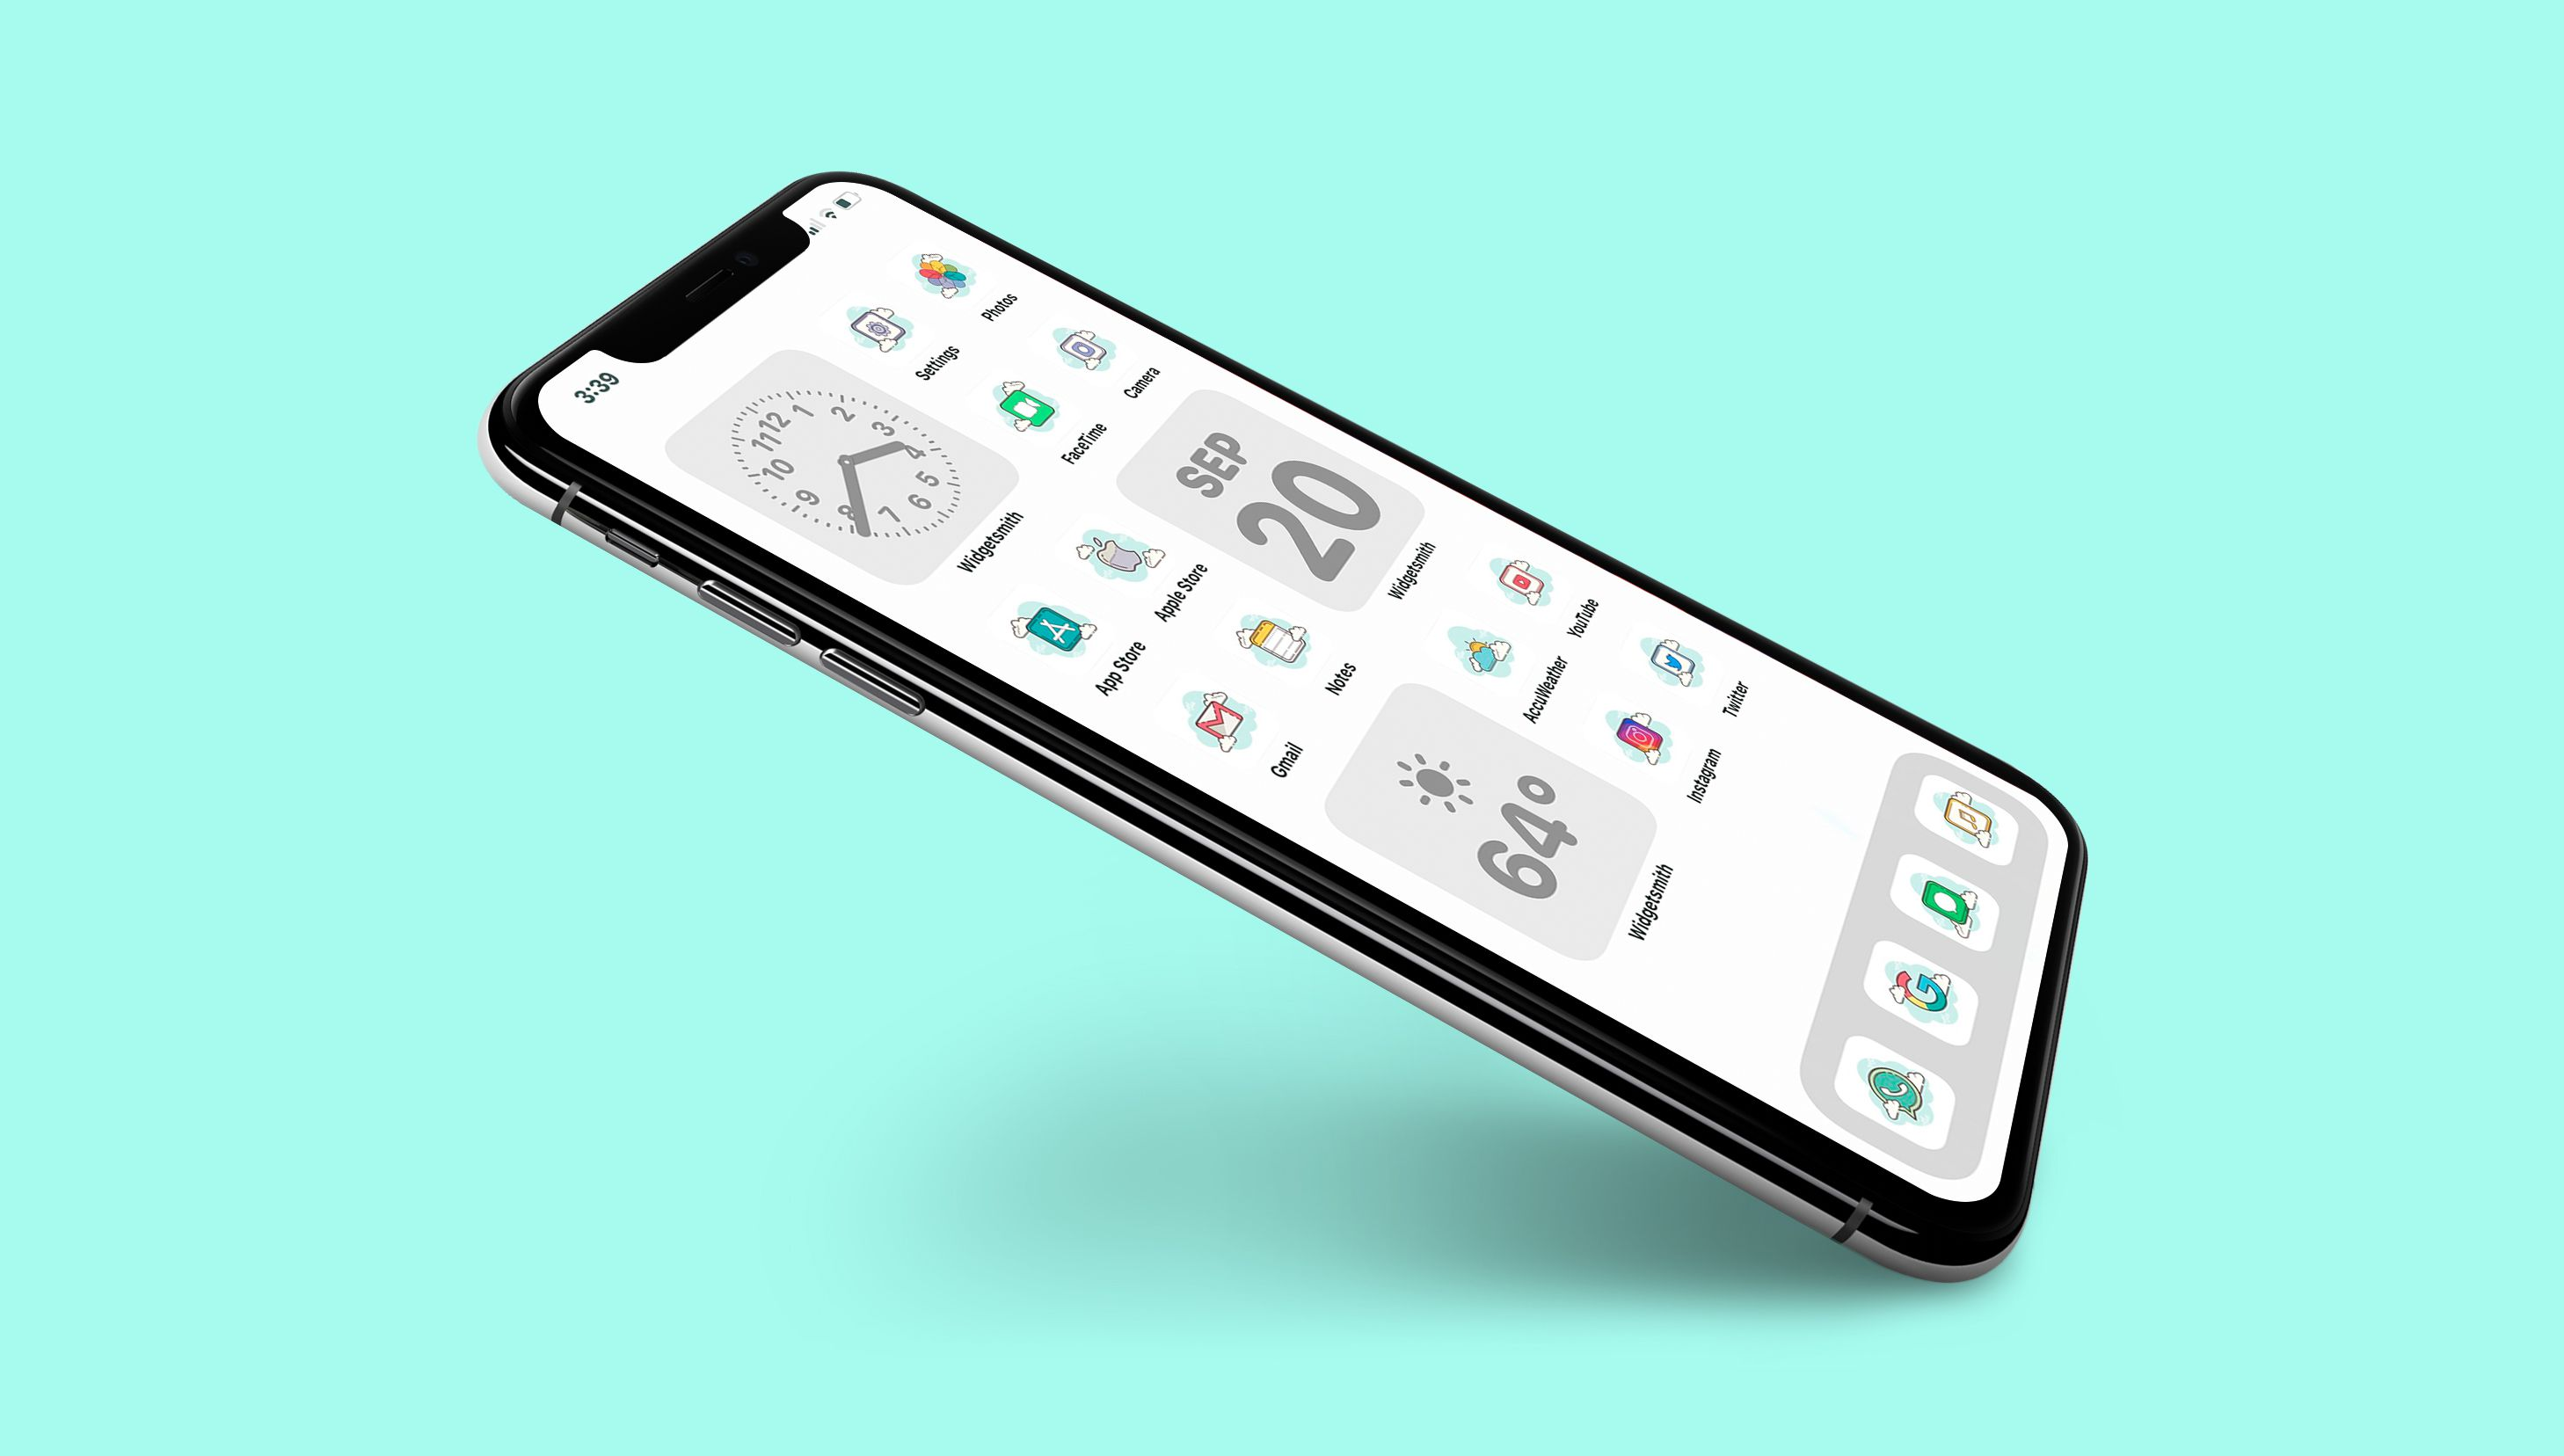 Ios 14 Widgets Offer Iphone Users Creative Home Screen Ideas Macrumors